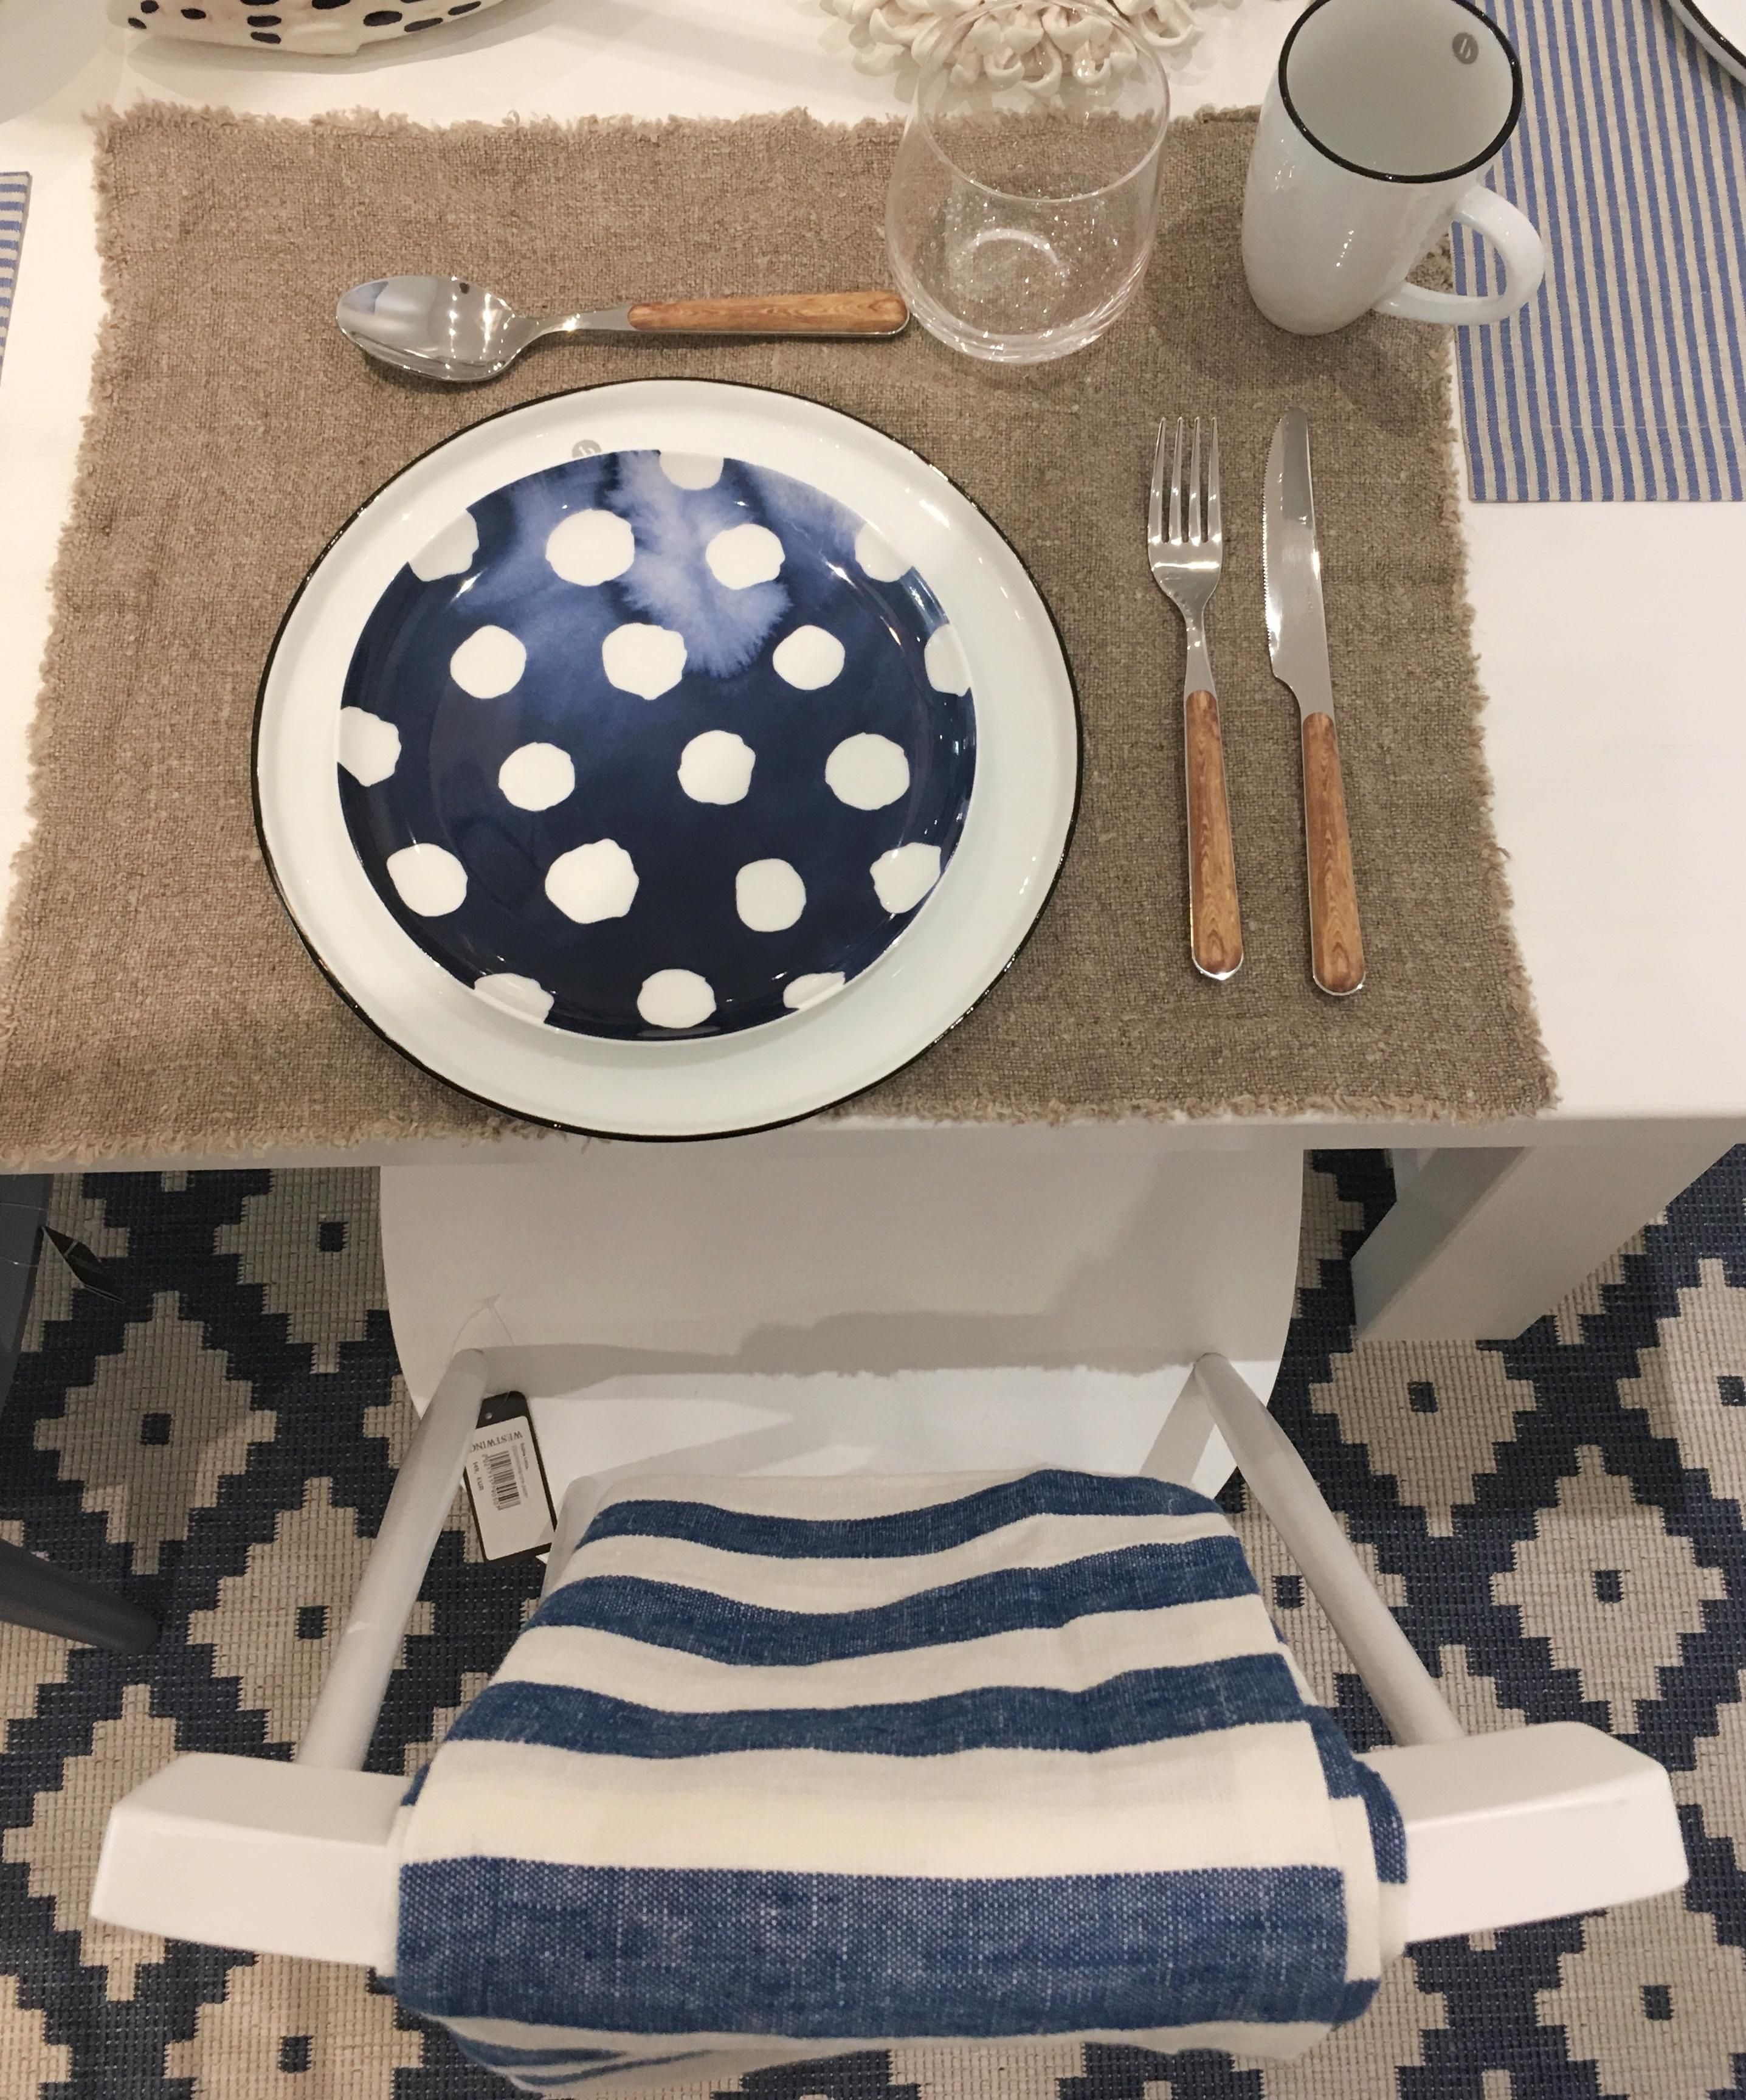 Tischdeko Inspiration Tischdeko Blauweiss Maritim